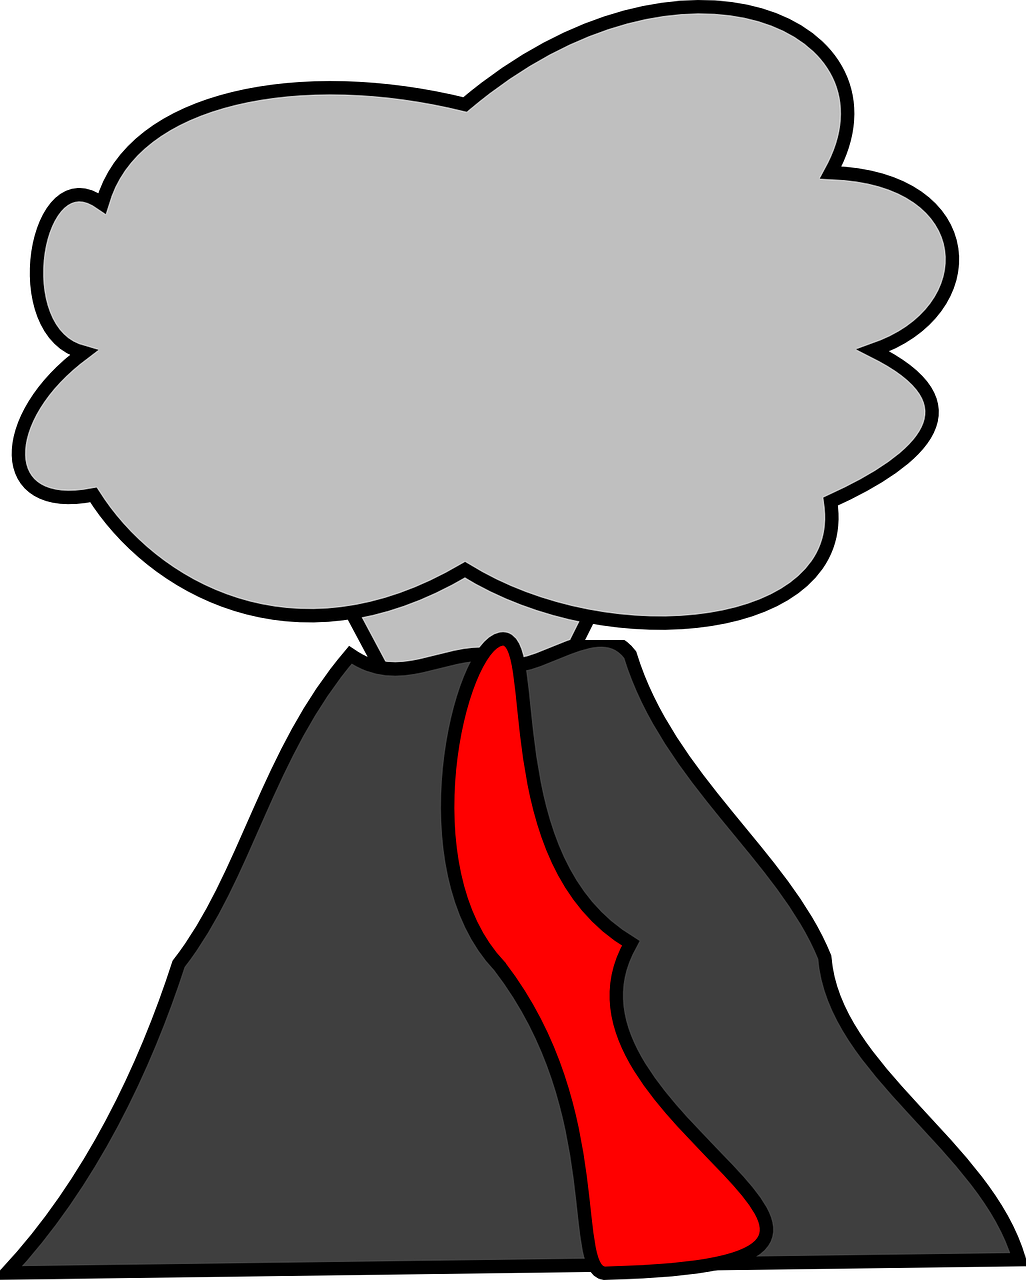 Free Simple Volcano Clip Art